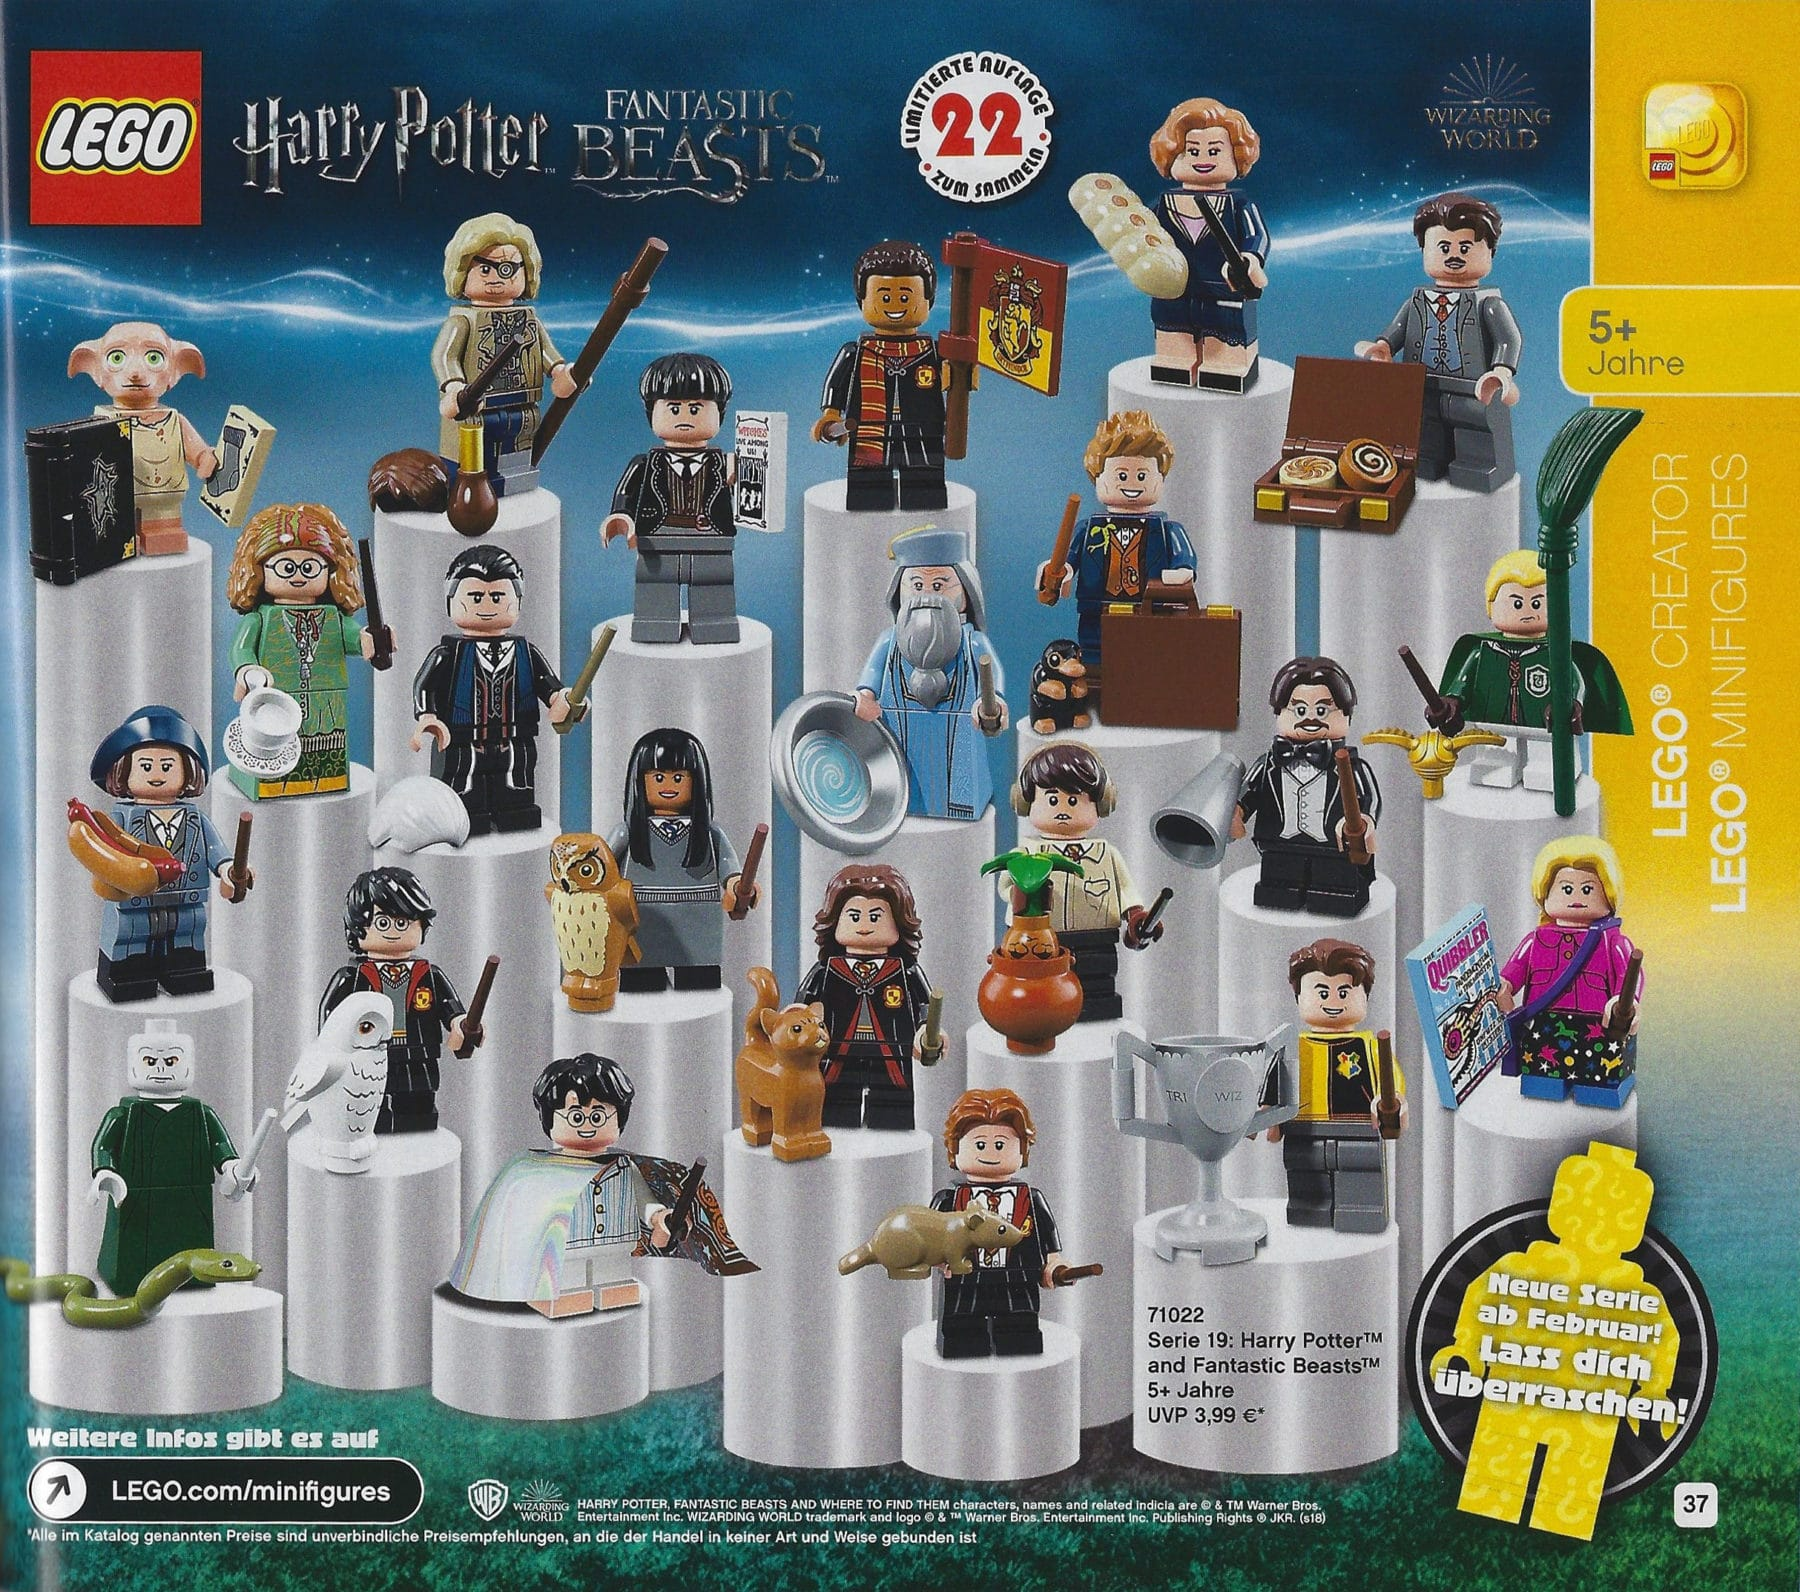 LEGO 71023: The LEGO Movie 2 Minifiguren Serie ab Februar 2019